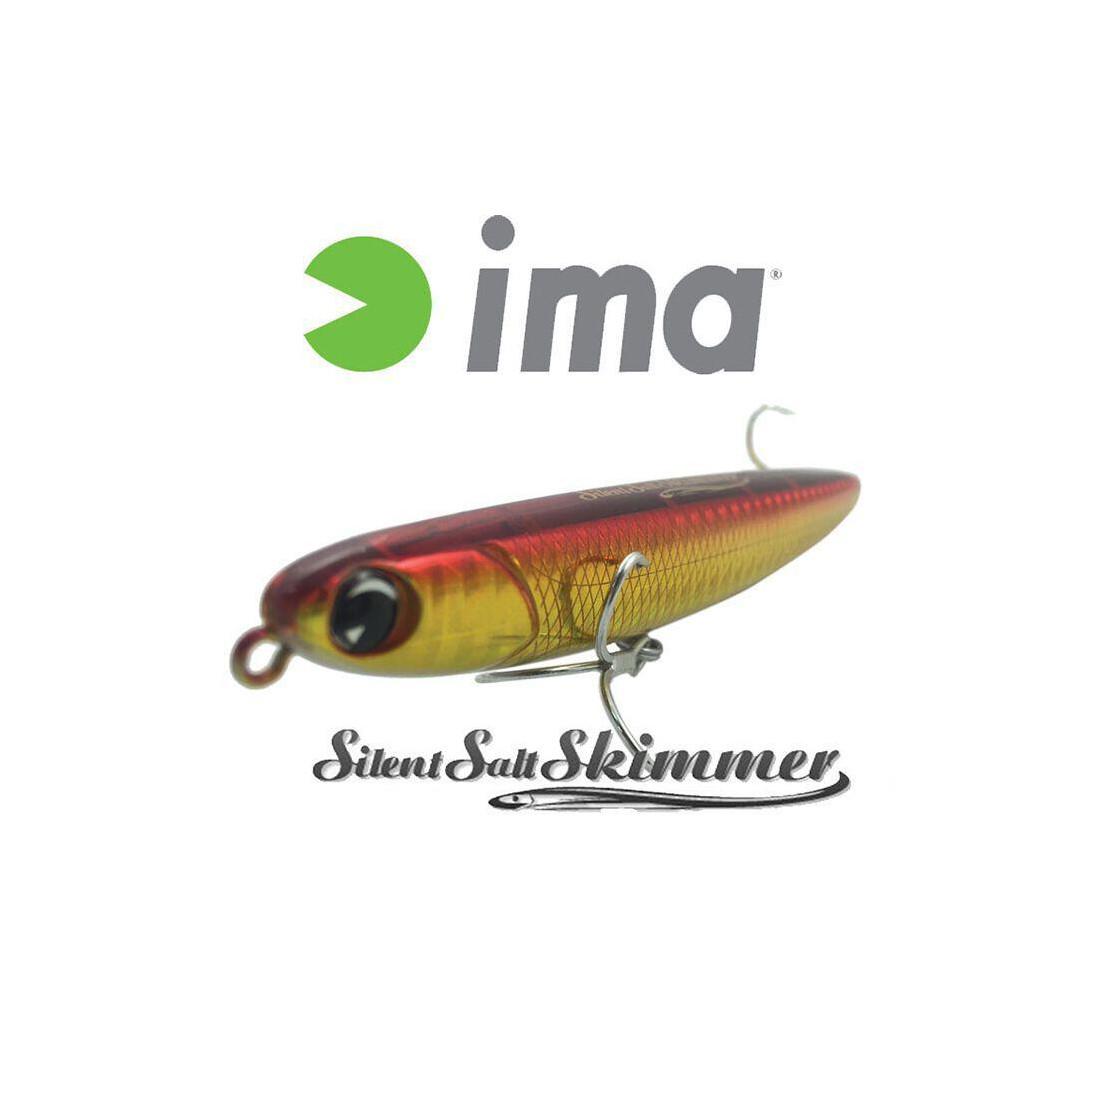 Simil IMA skimmer Surface lure walk the dog Sea Fishing 13G11cm